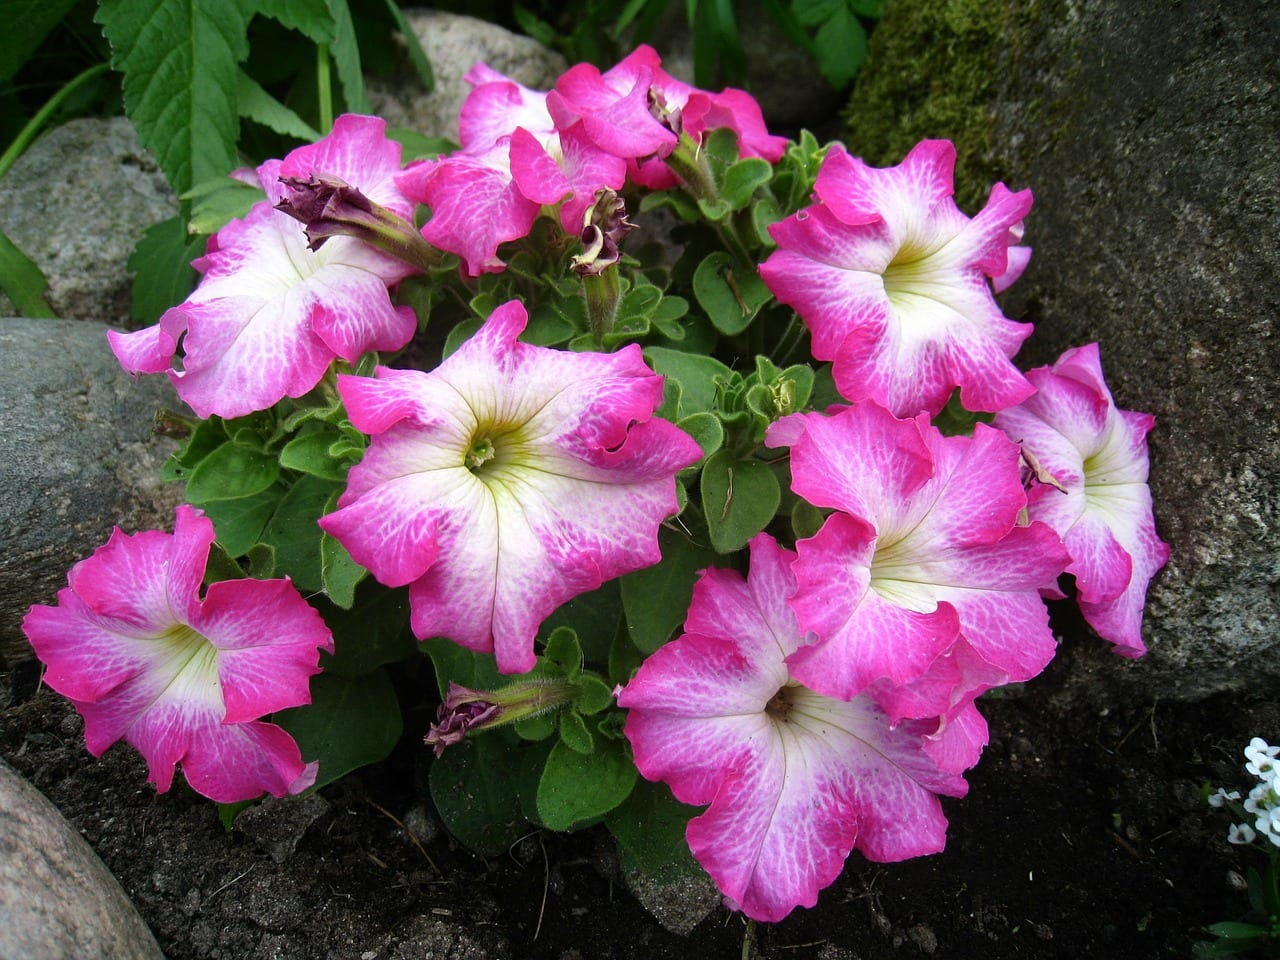 Disfruta de tus petunias plantándolas en macetas colgantes